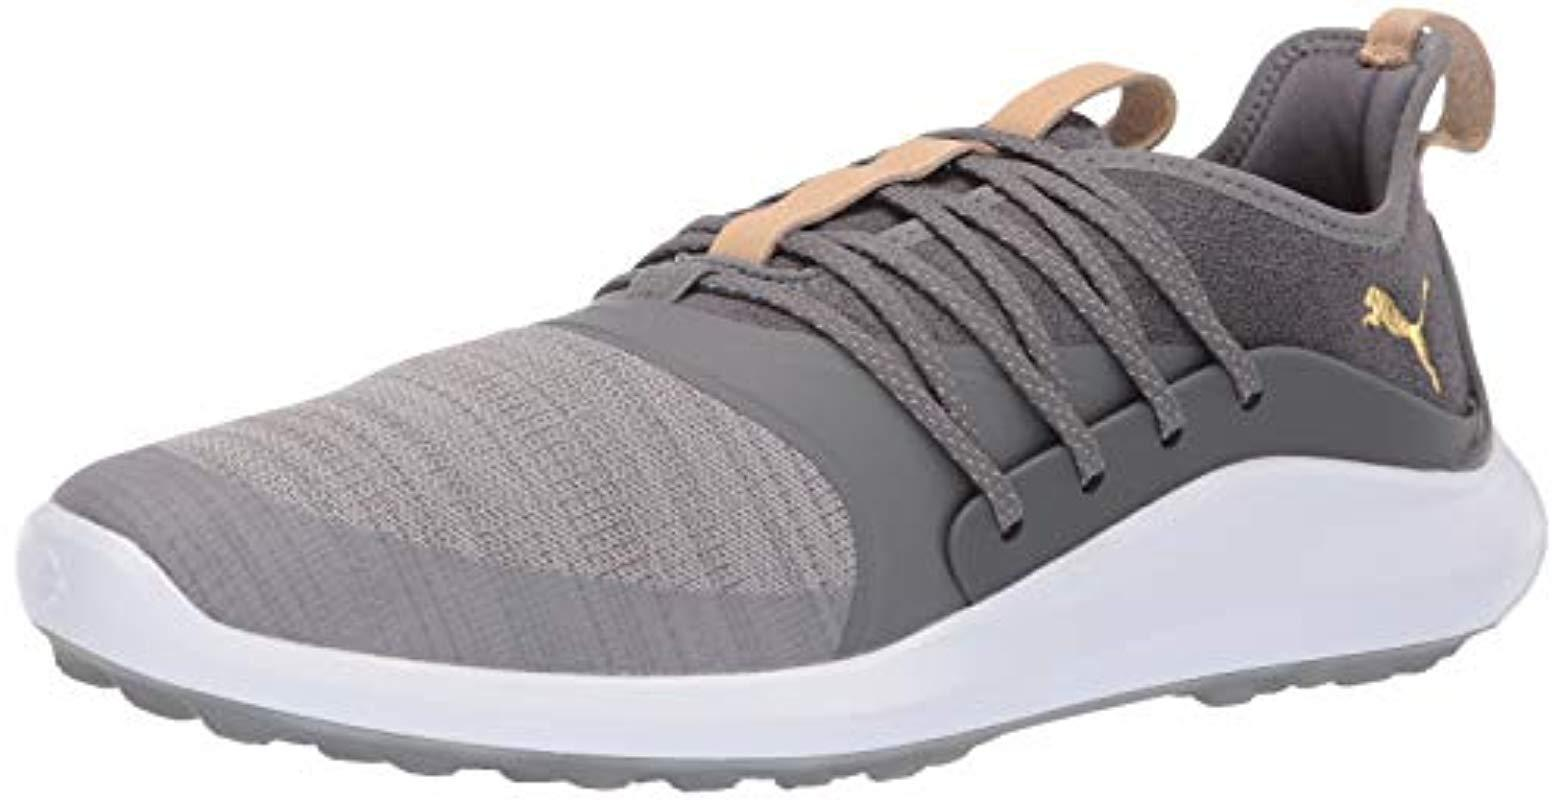 4ecbe7a7cdab2 Men's Gray Ignite Nxt Solelace Golf Shoe